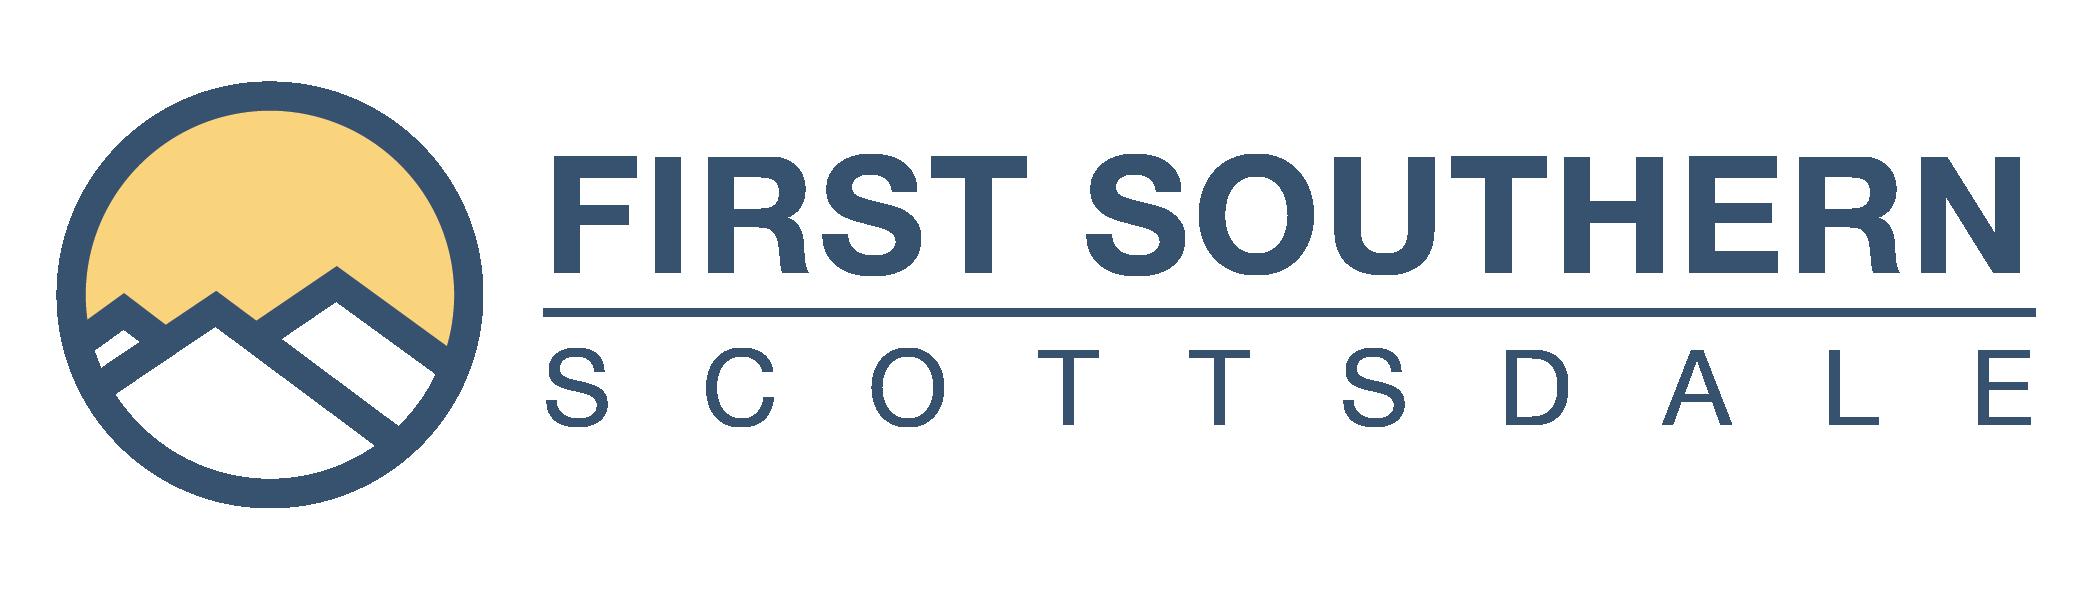 First Southern Baptist Church Scottsdale